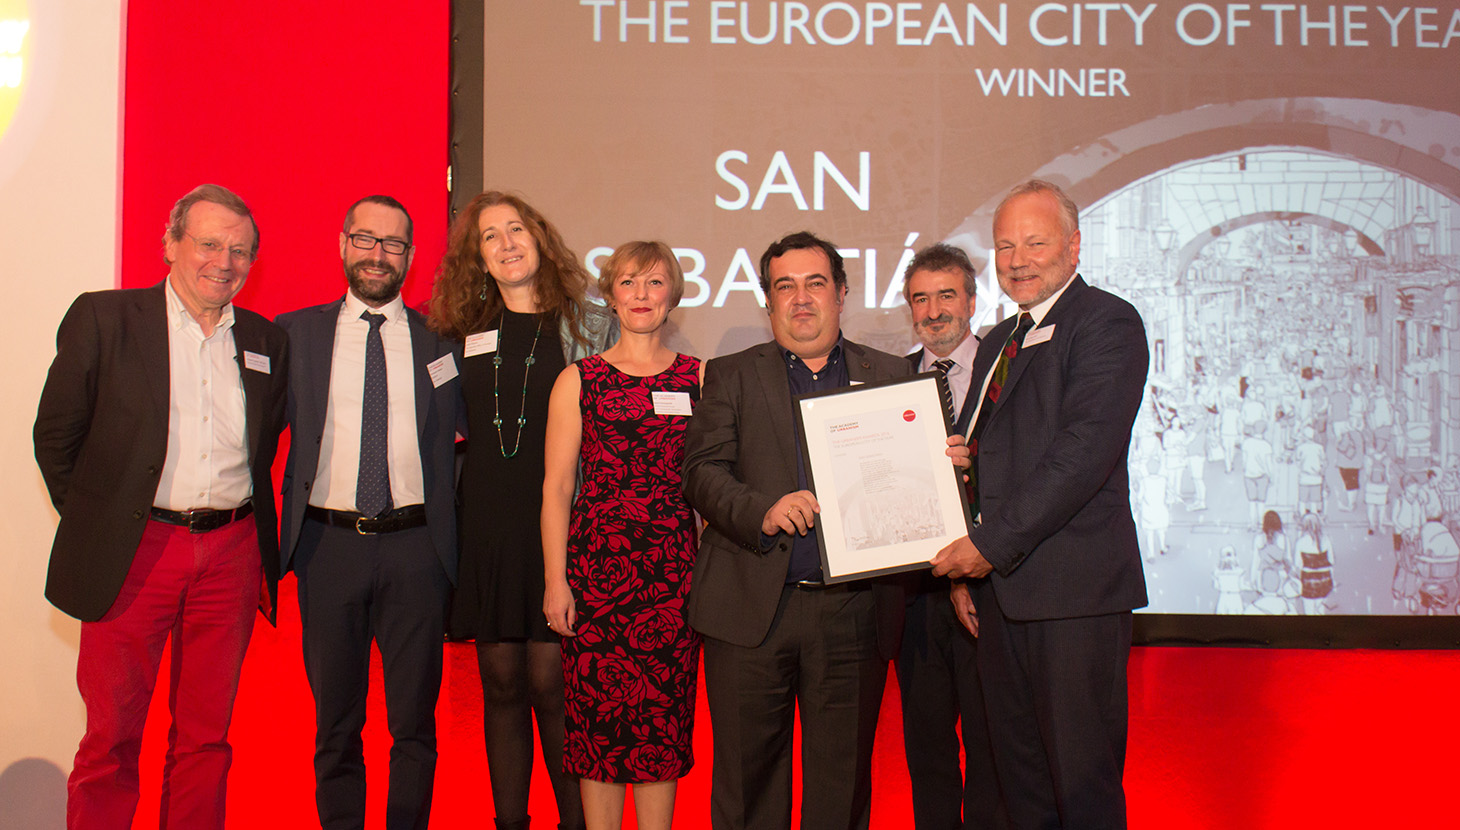 Deputy Mayor of San Sebastián, Ernesto Gasco, collects the European City of the Year Award